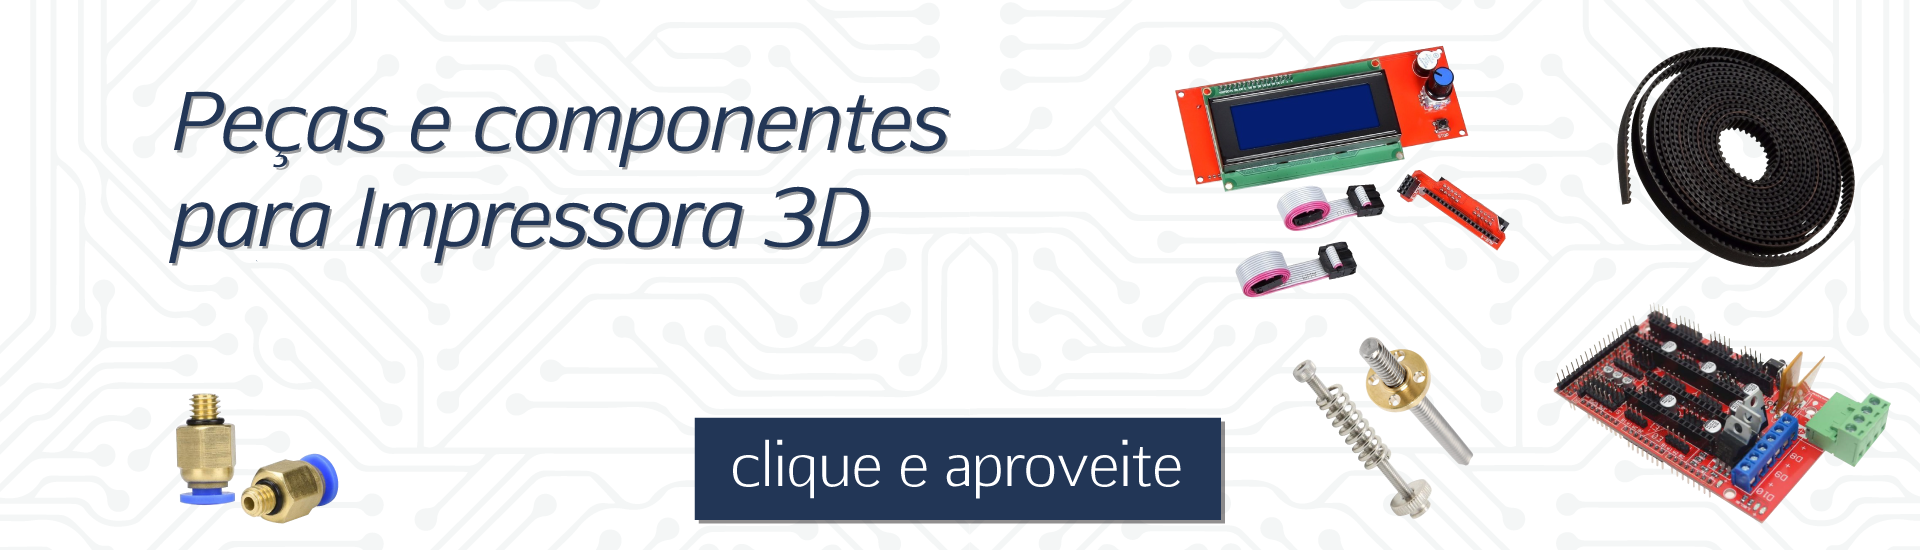 impressao_3d_partes